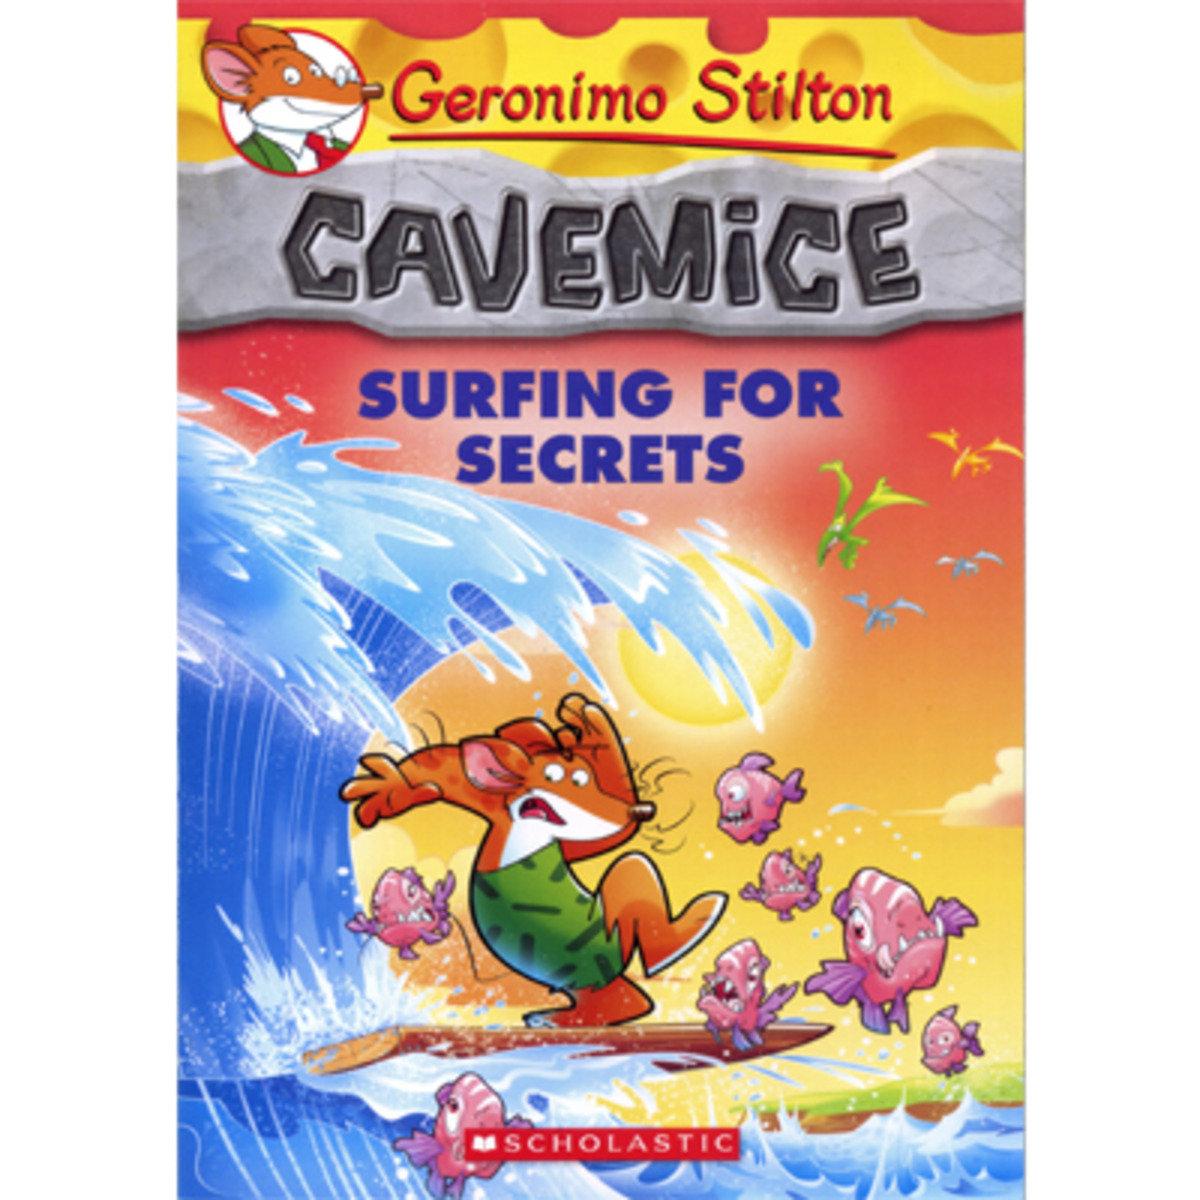 Geronimo Stilton Cavemice #8: Surfing for Secrets 9780545746175